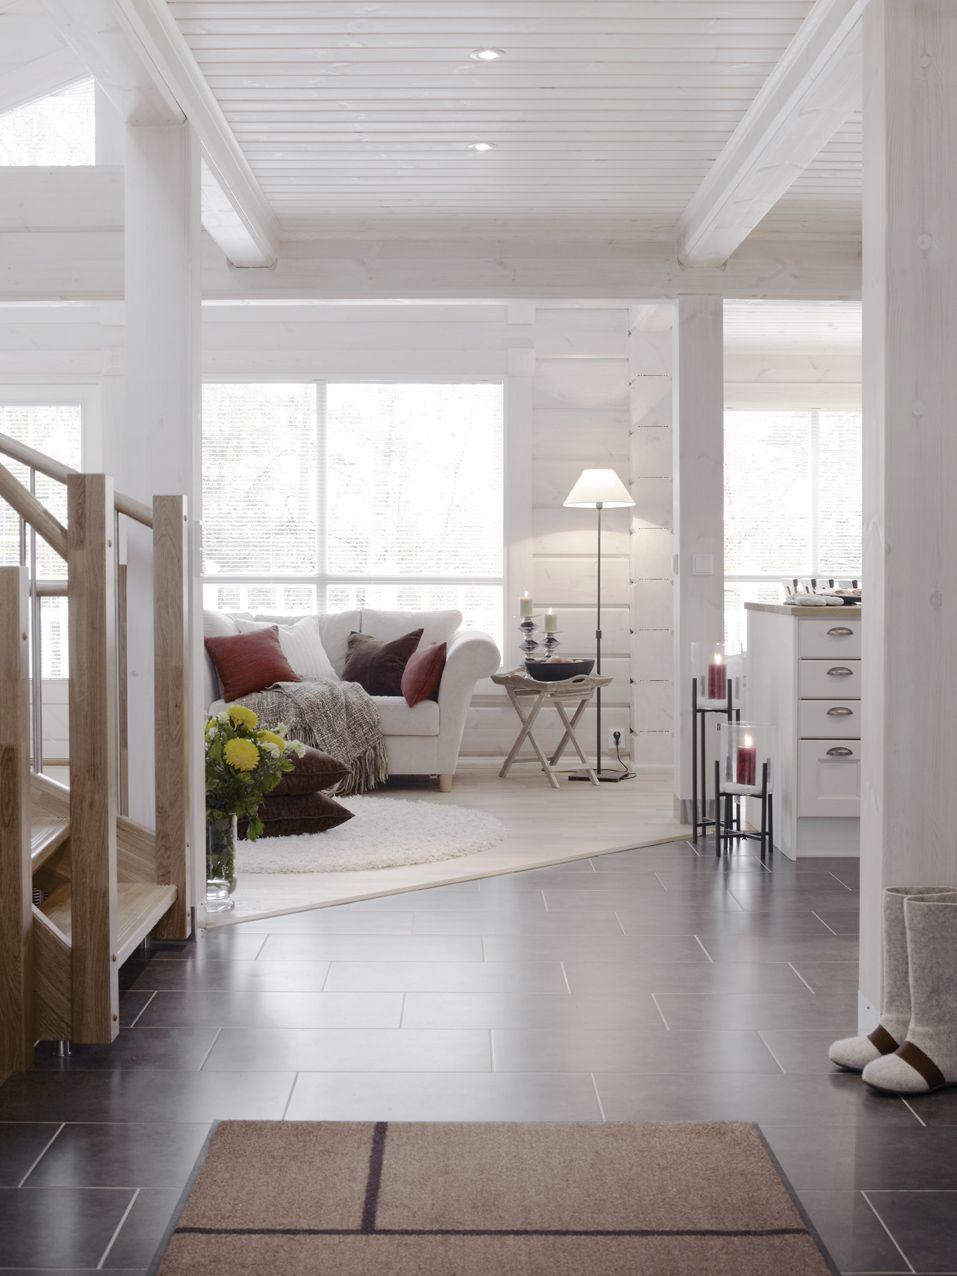 Vaalea hirsi   My future home   Pinterest   Logs, House and Cabin